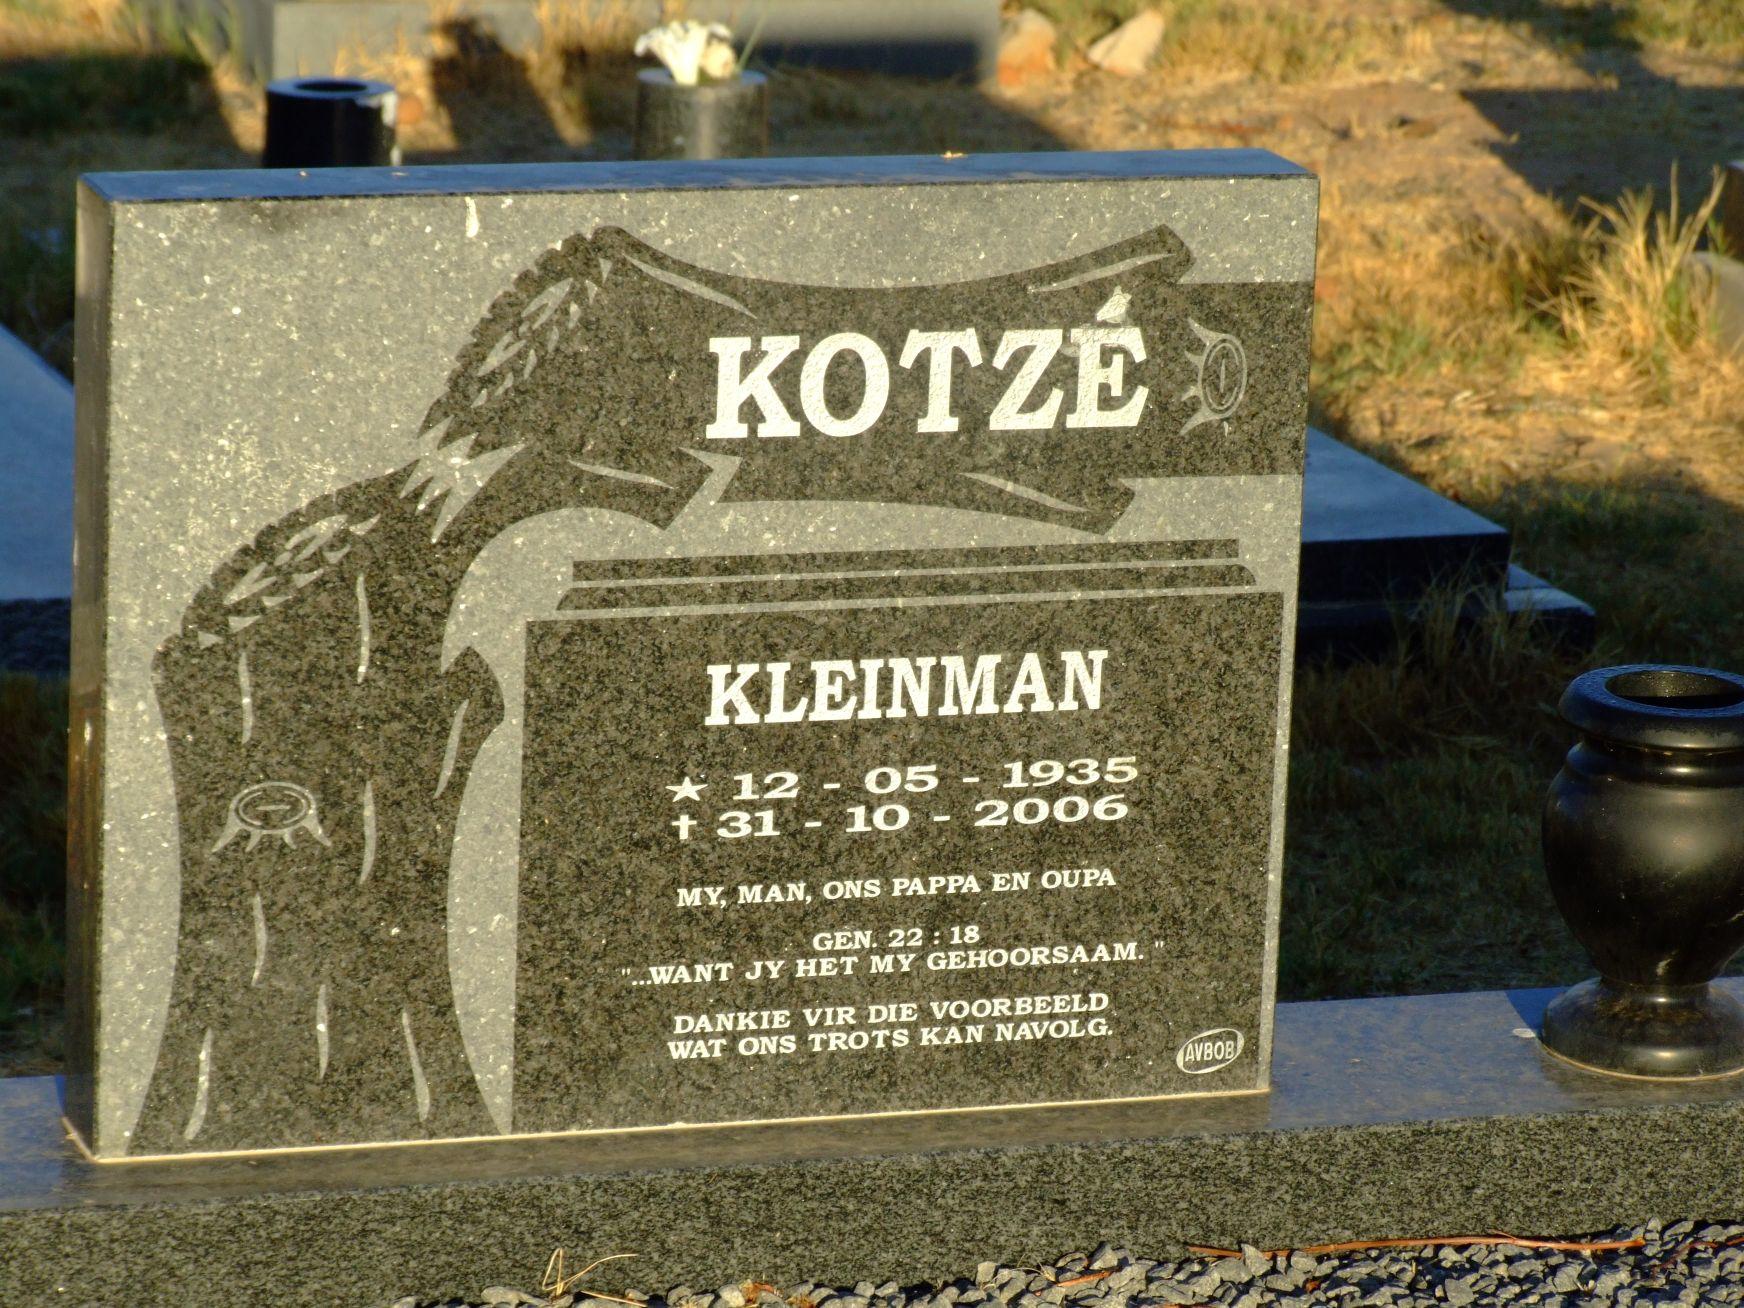 Kotze, Kleinman